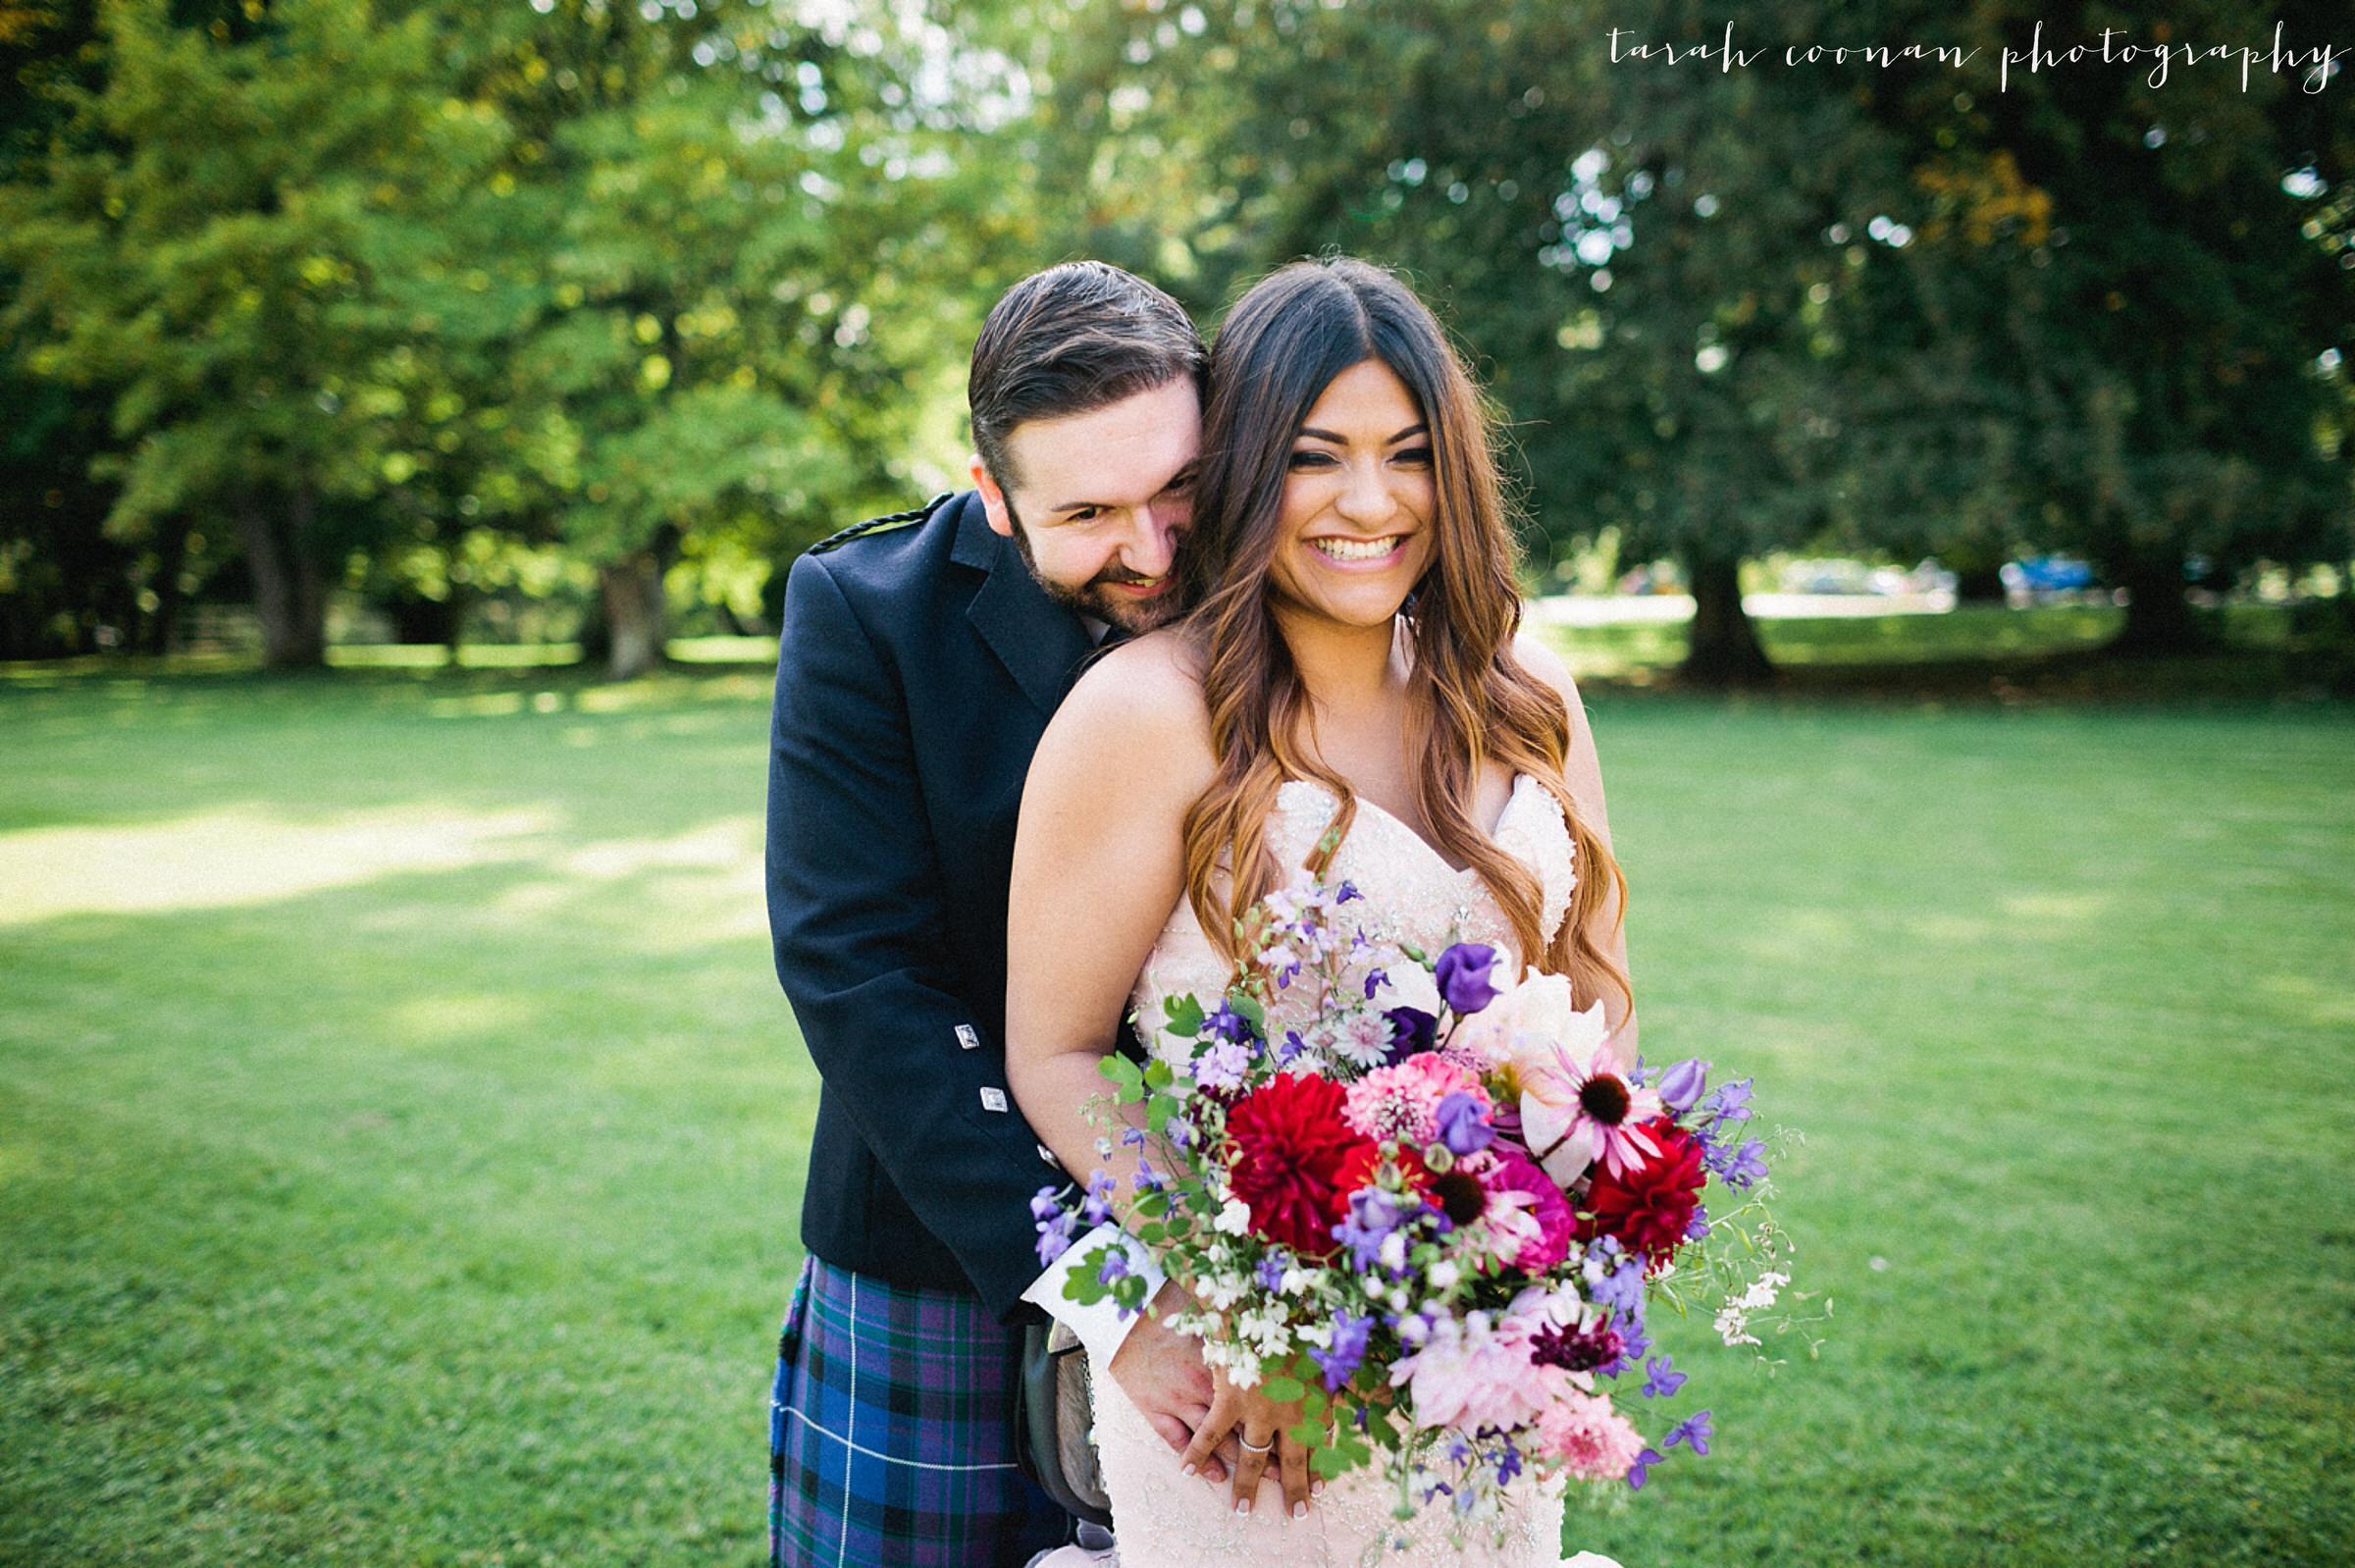 cosmos wedding bouquet